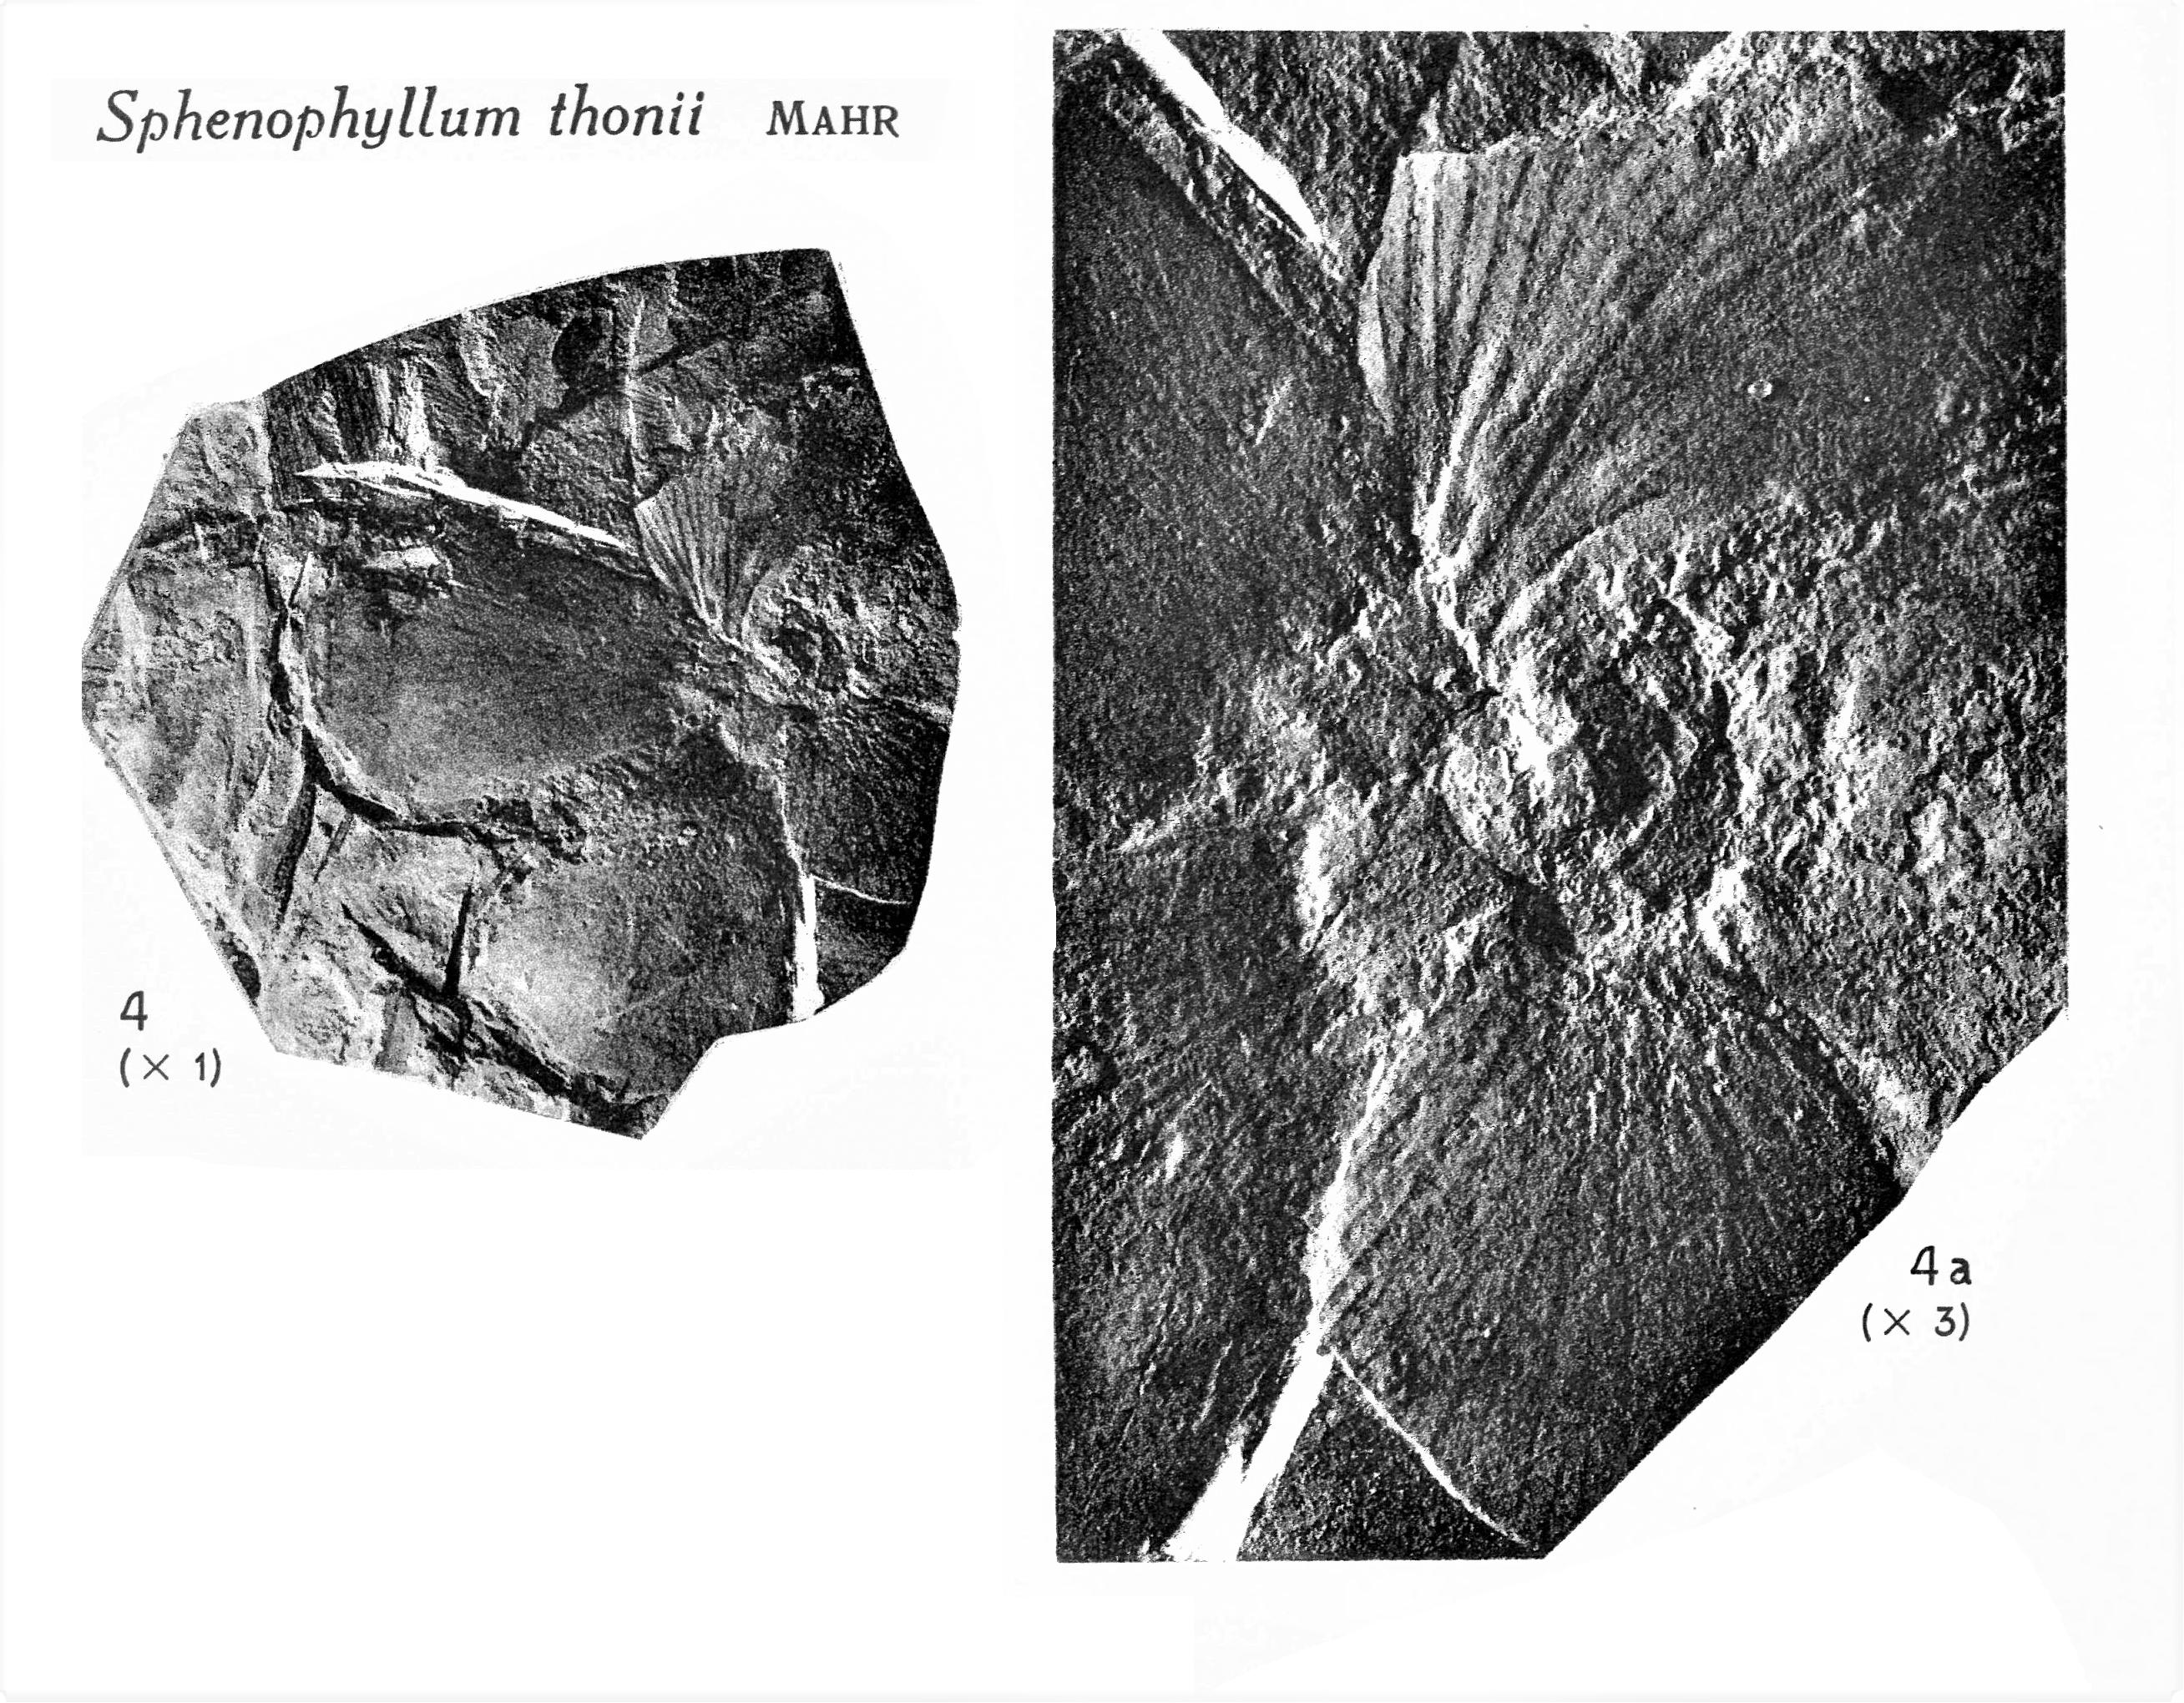 Pl. XV ; Fig 4, 4a